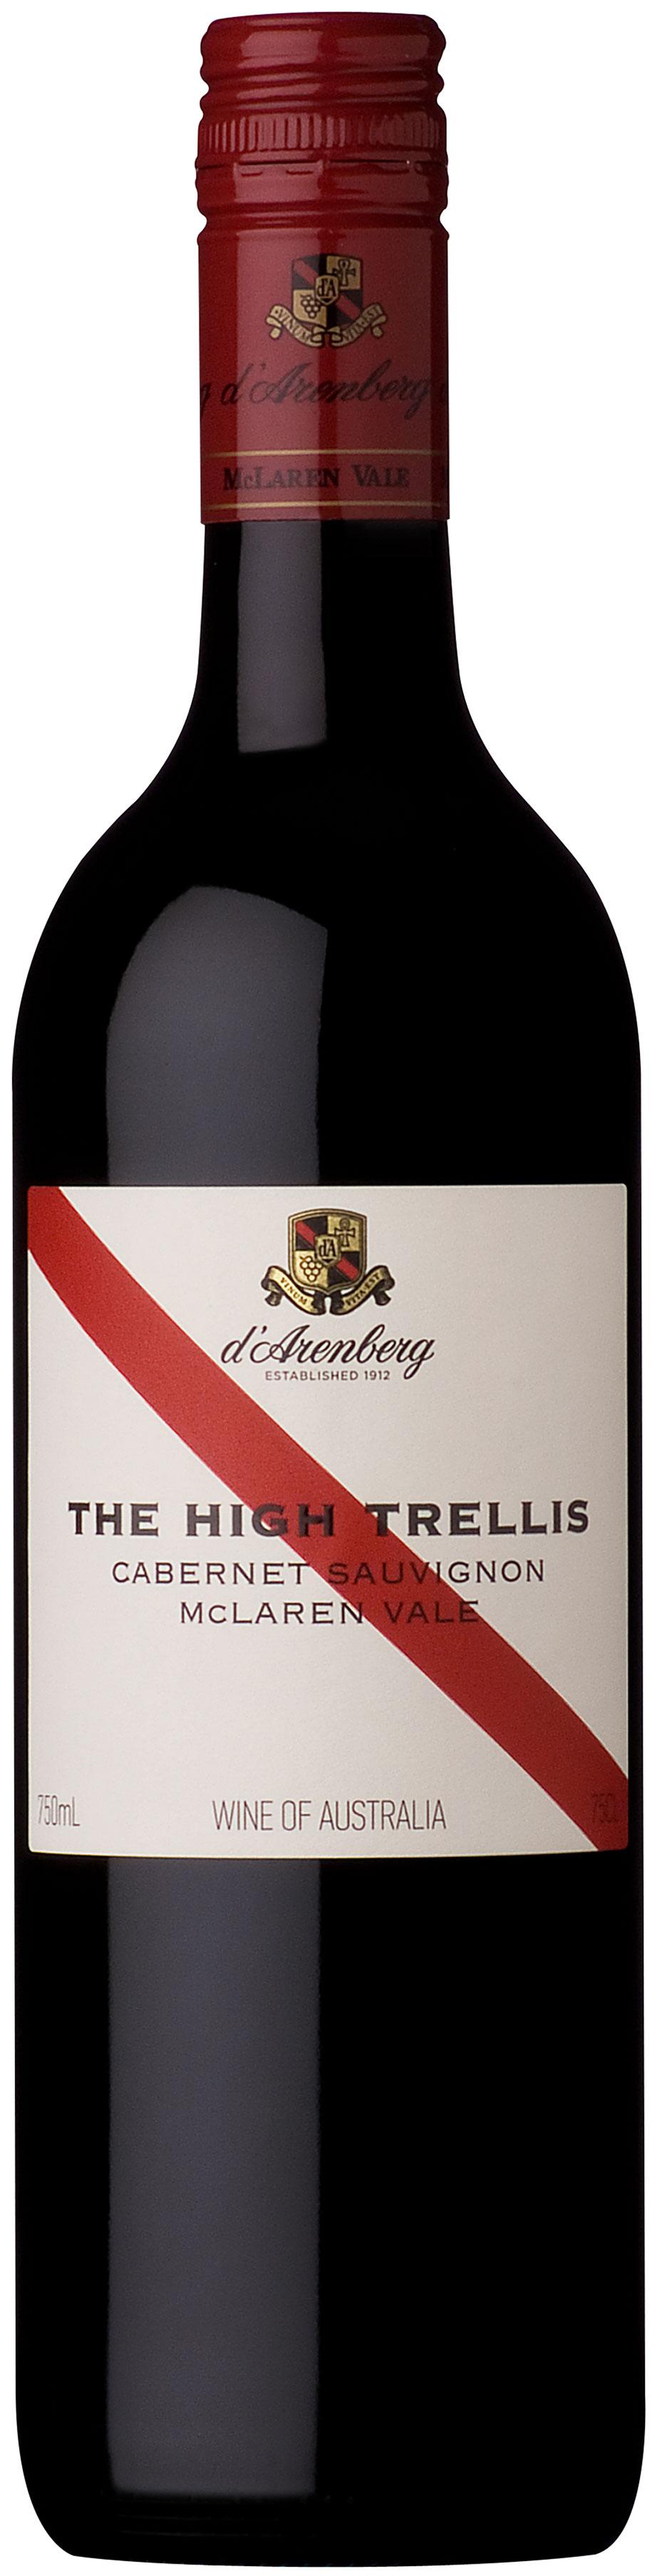 https://vinocorpperu.com/images/vinos/darenberg/the_high_trellis_cabernet_sauvignon_2016.jpg